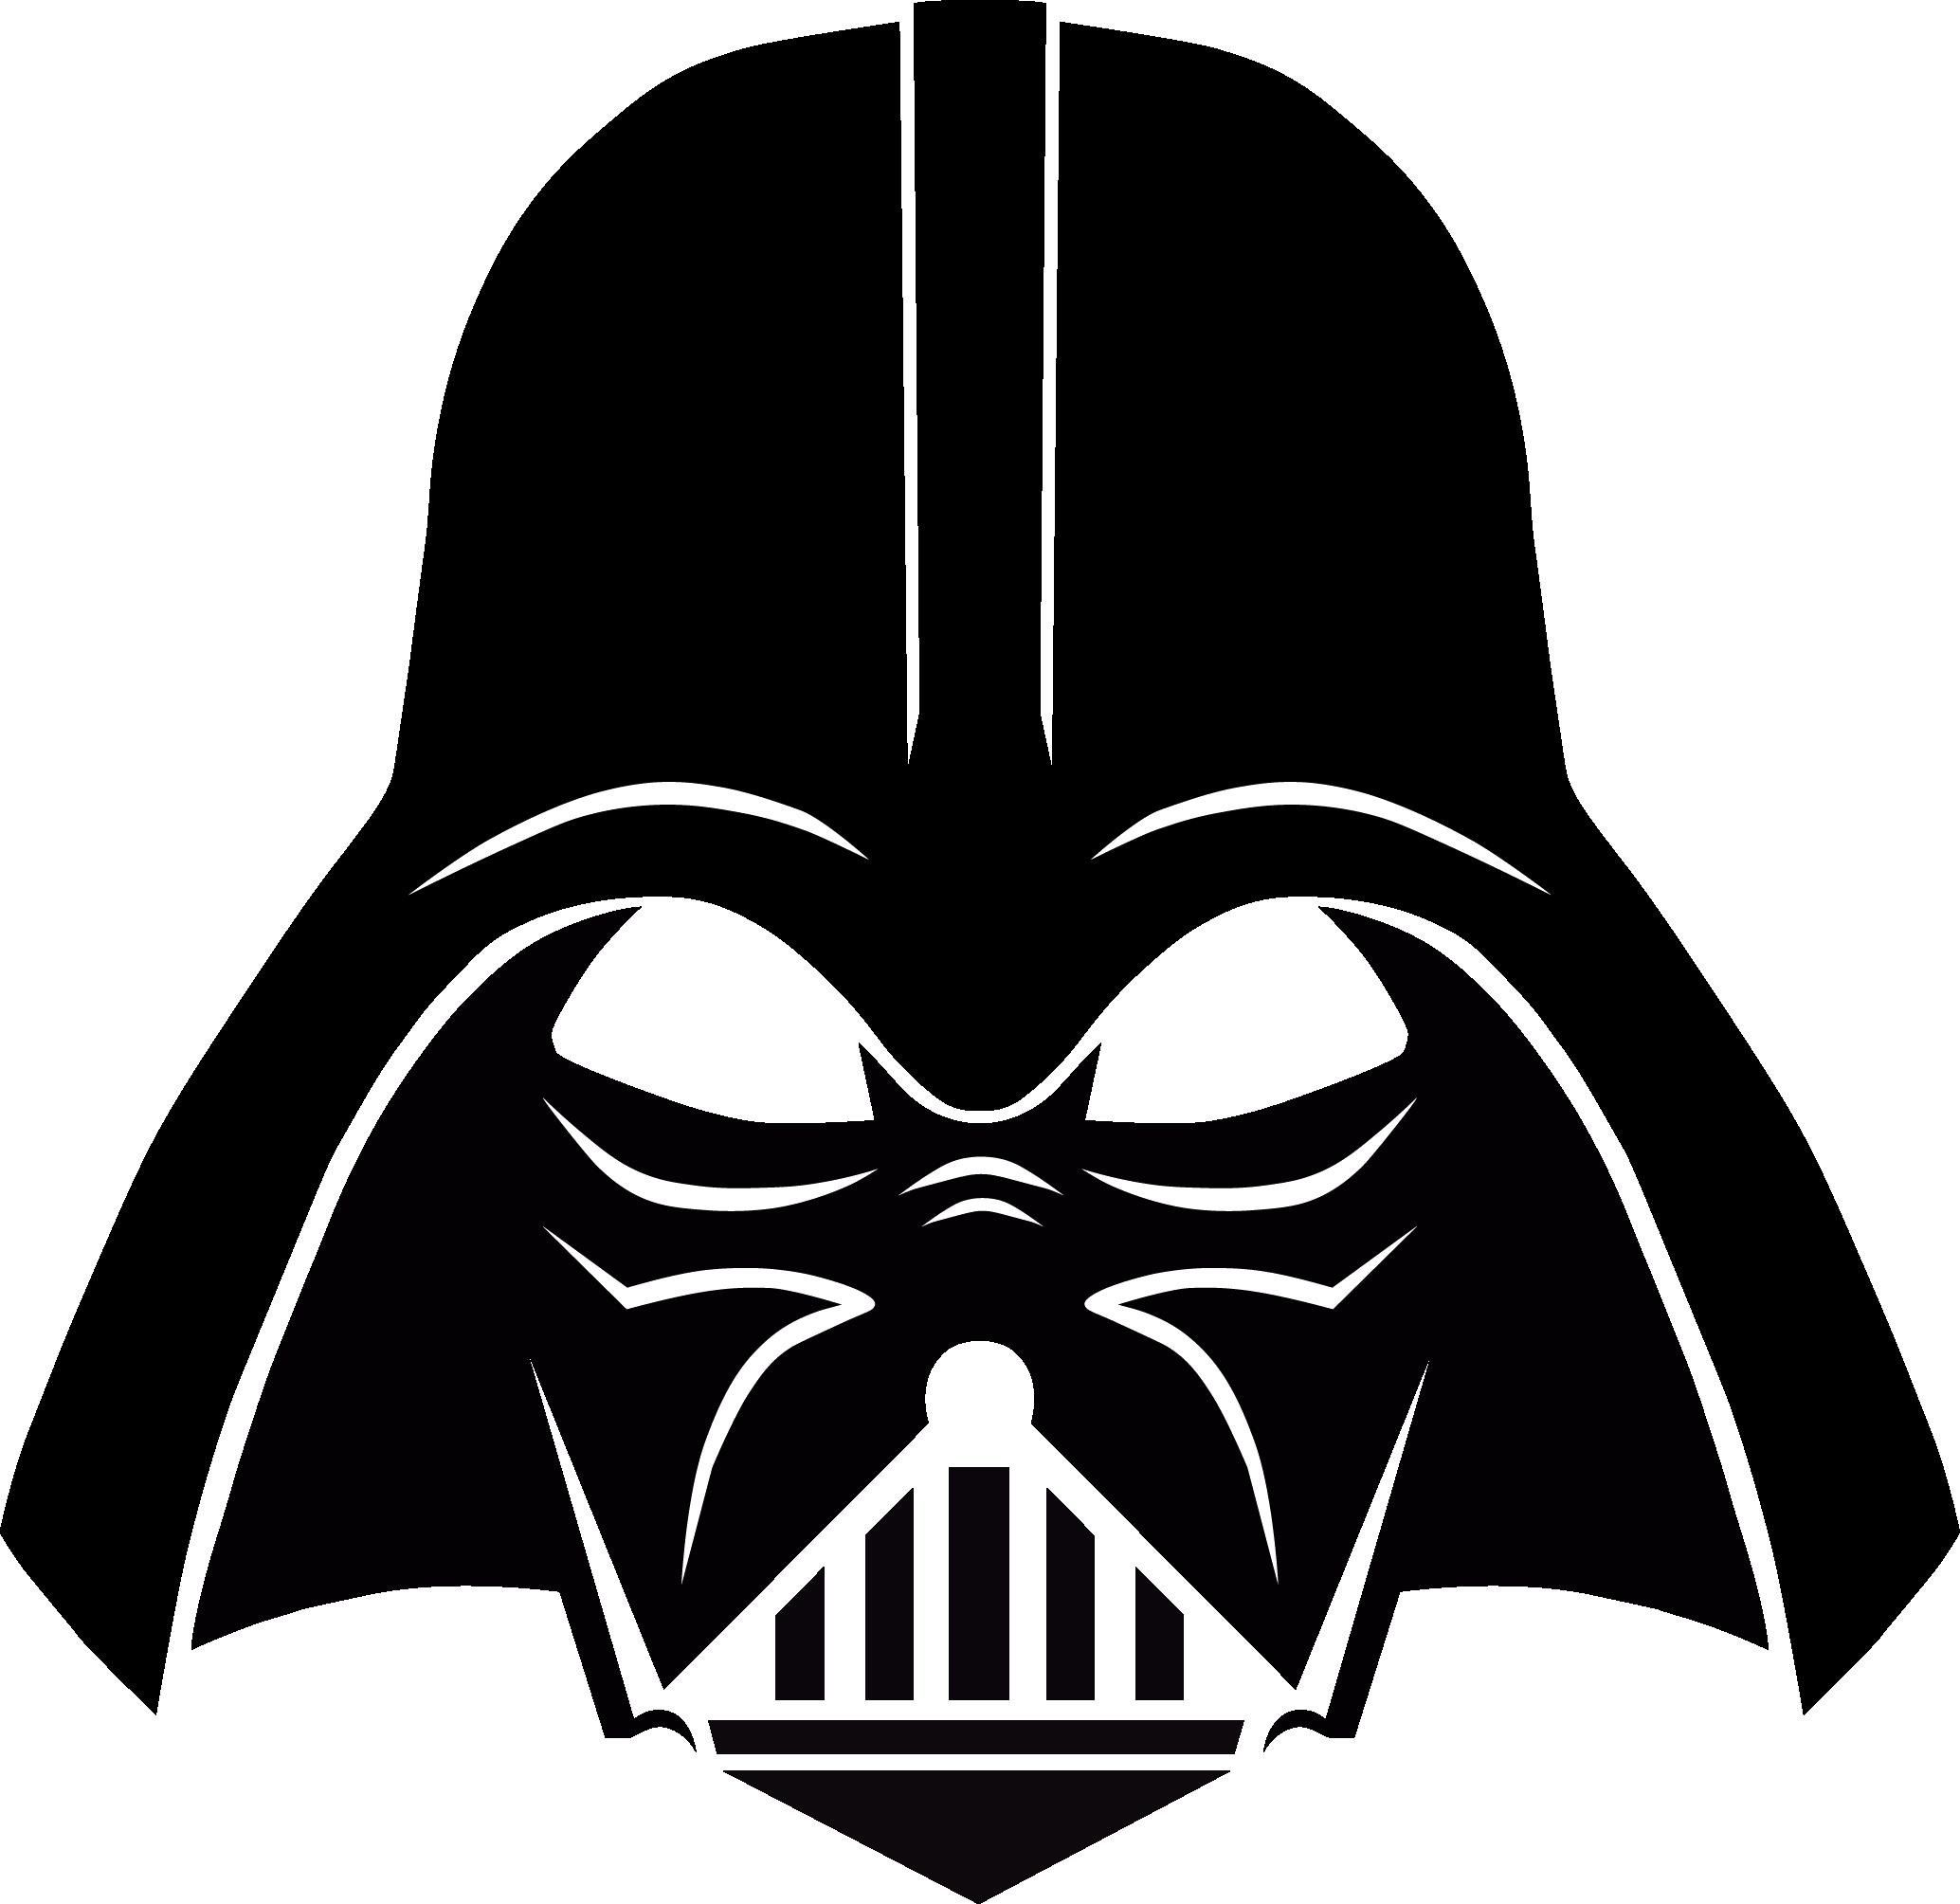 Darth Vader Stencil, free download.